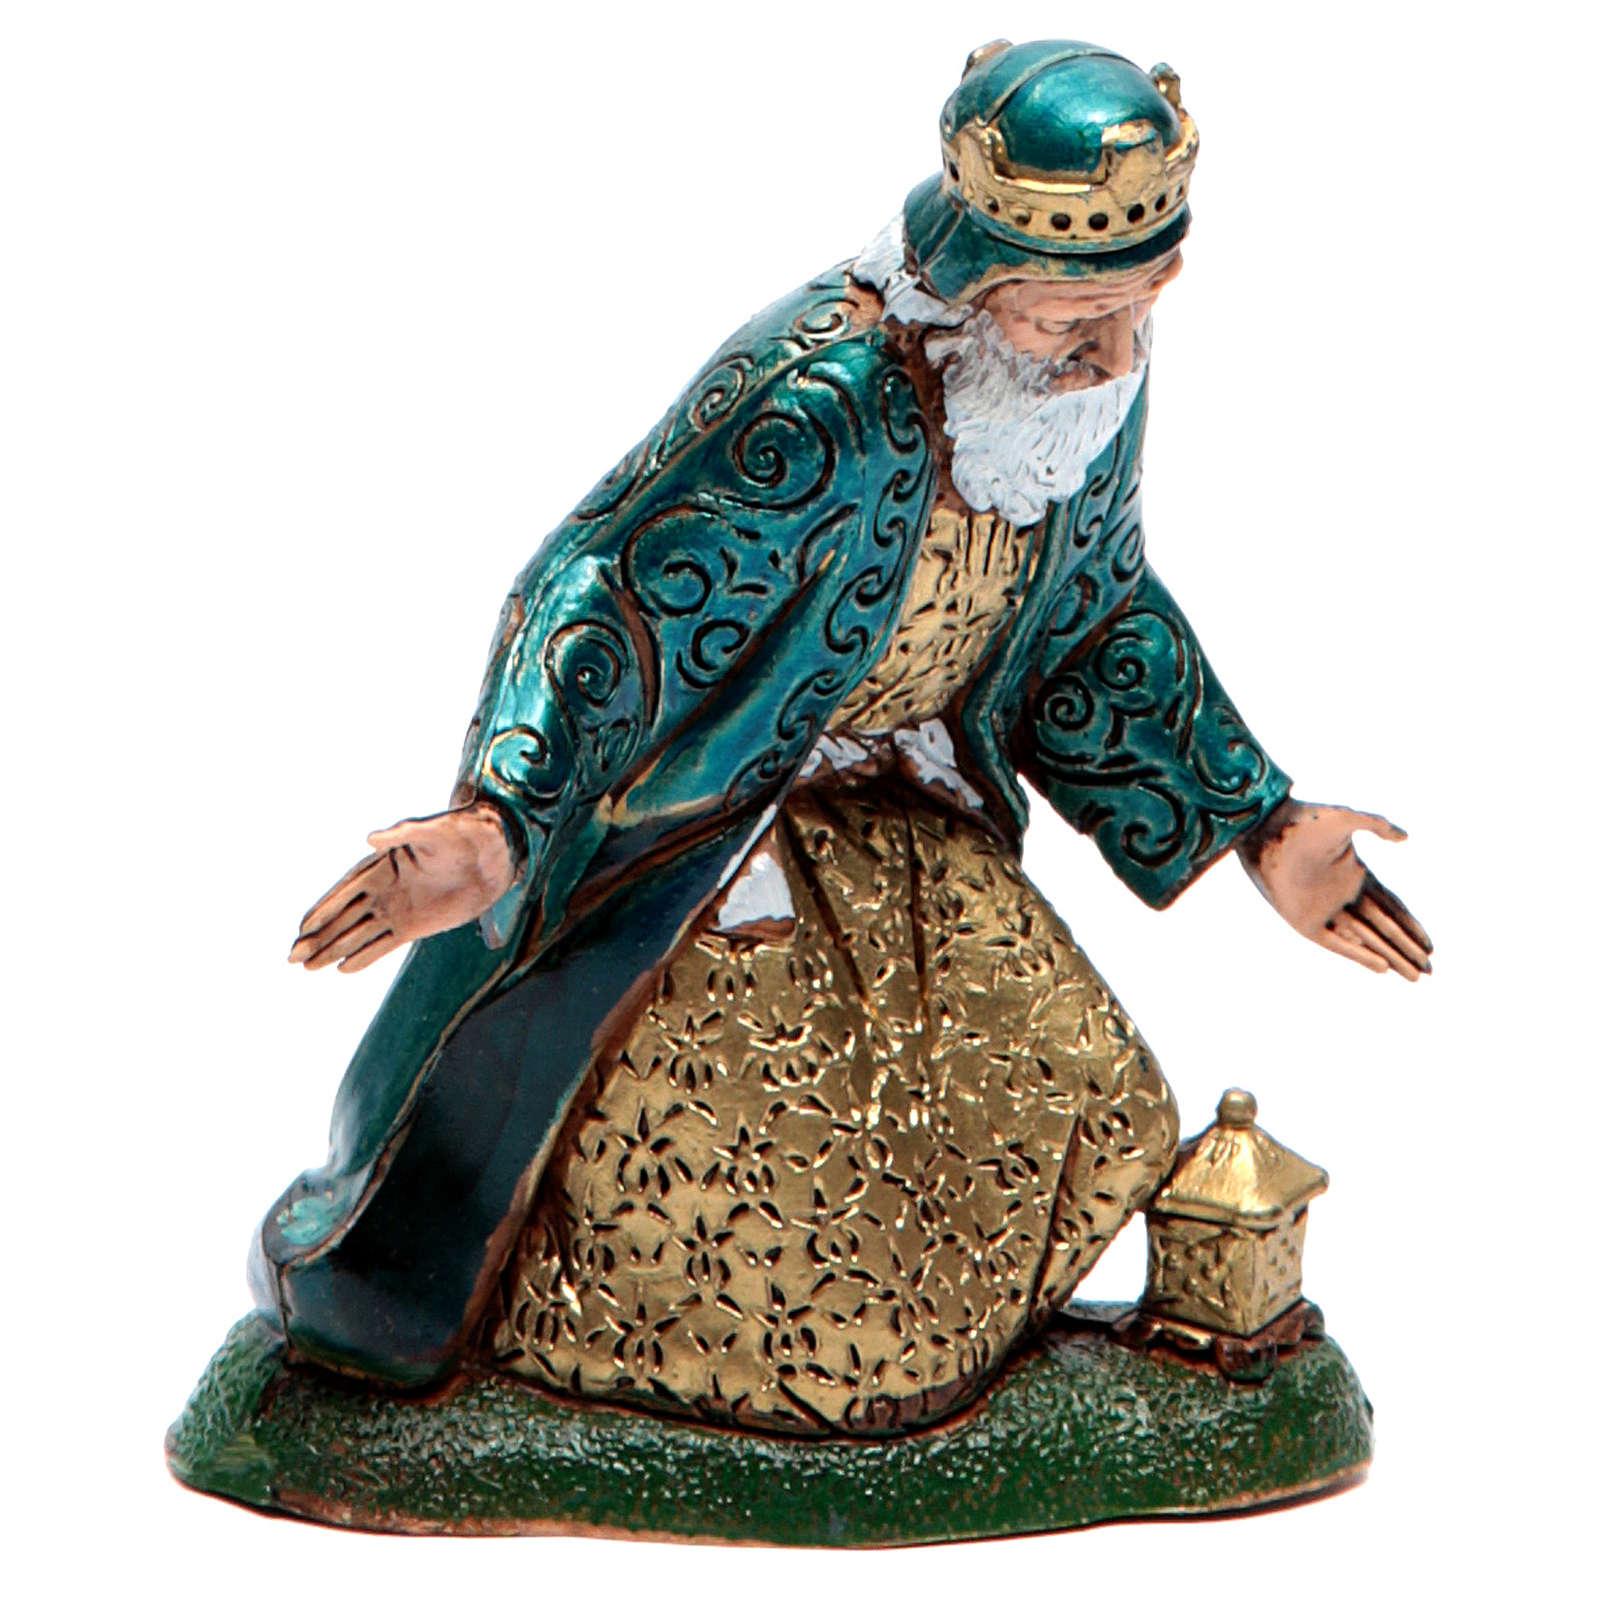 Moranduzzo nativity scene figurine 12cm, white wise king 4